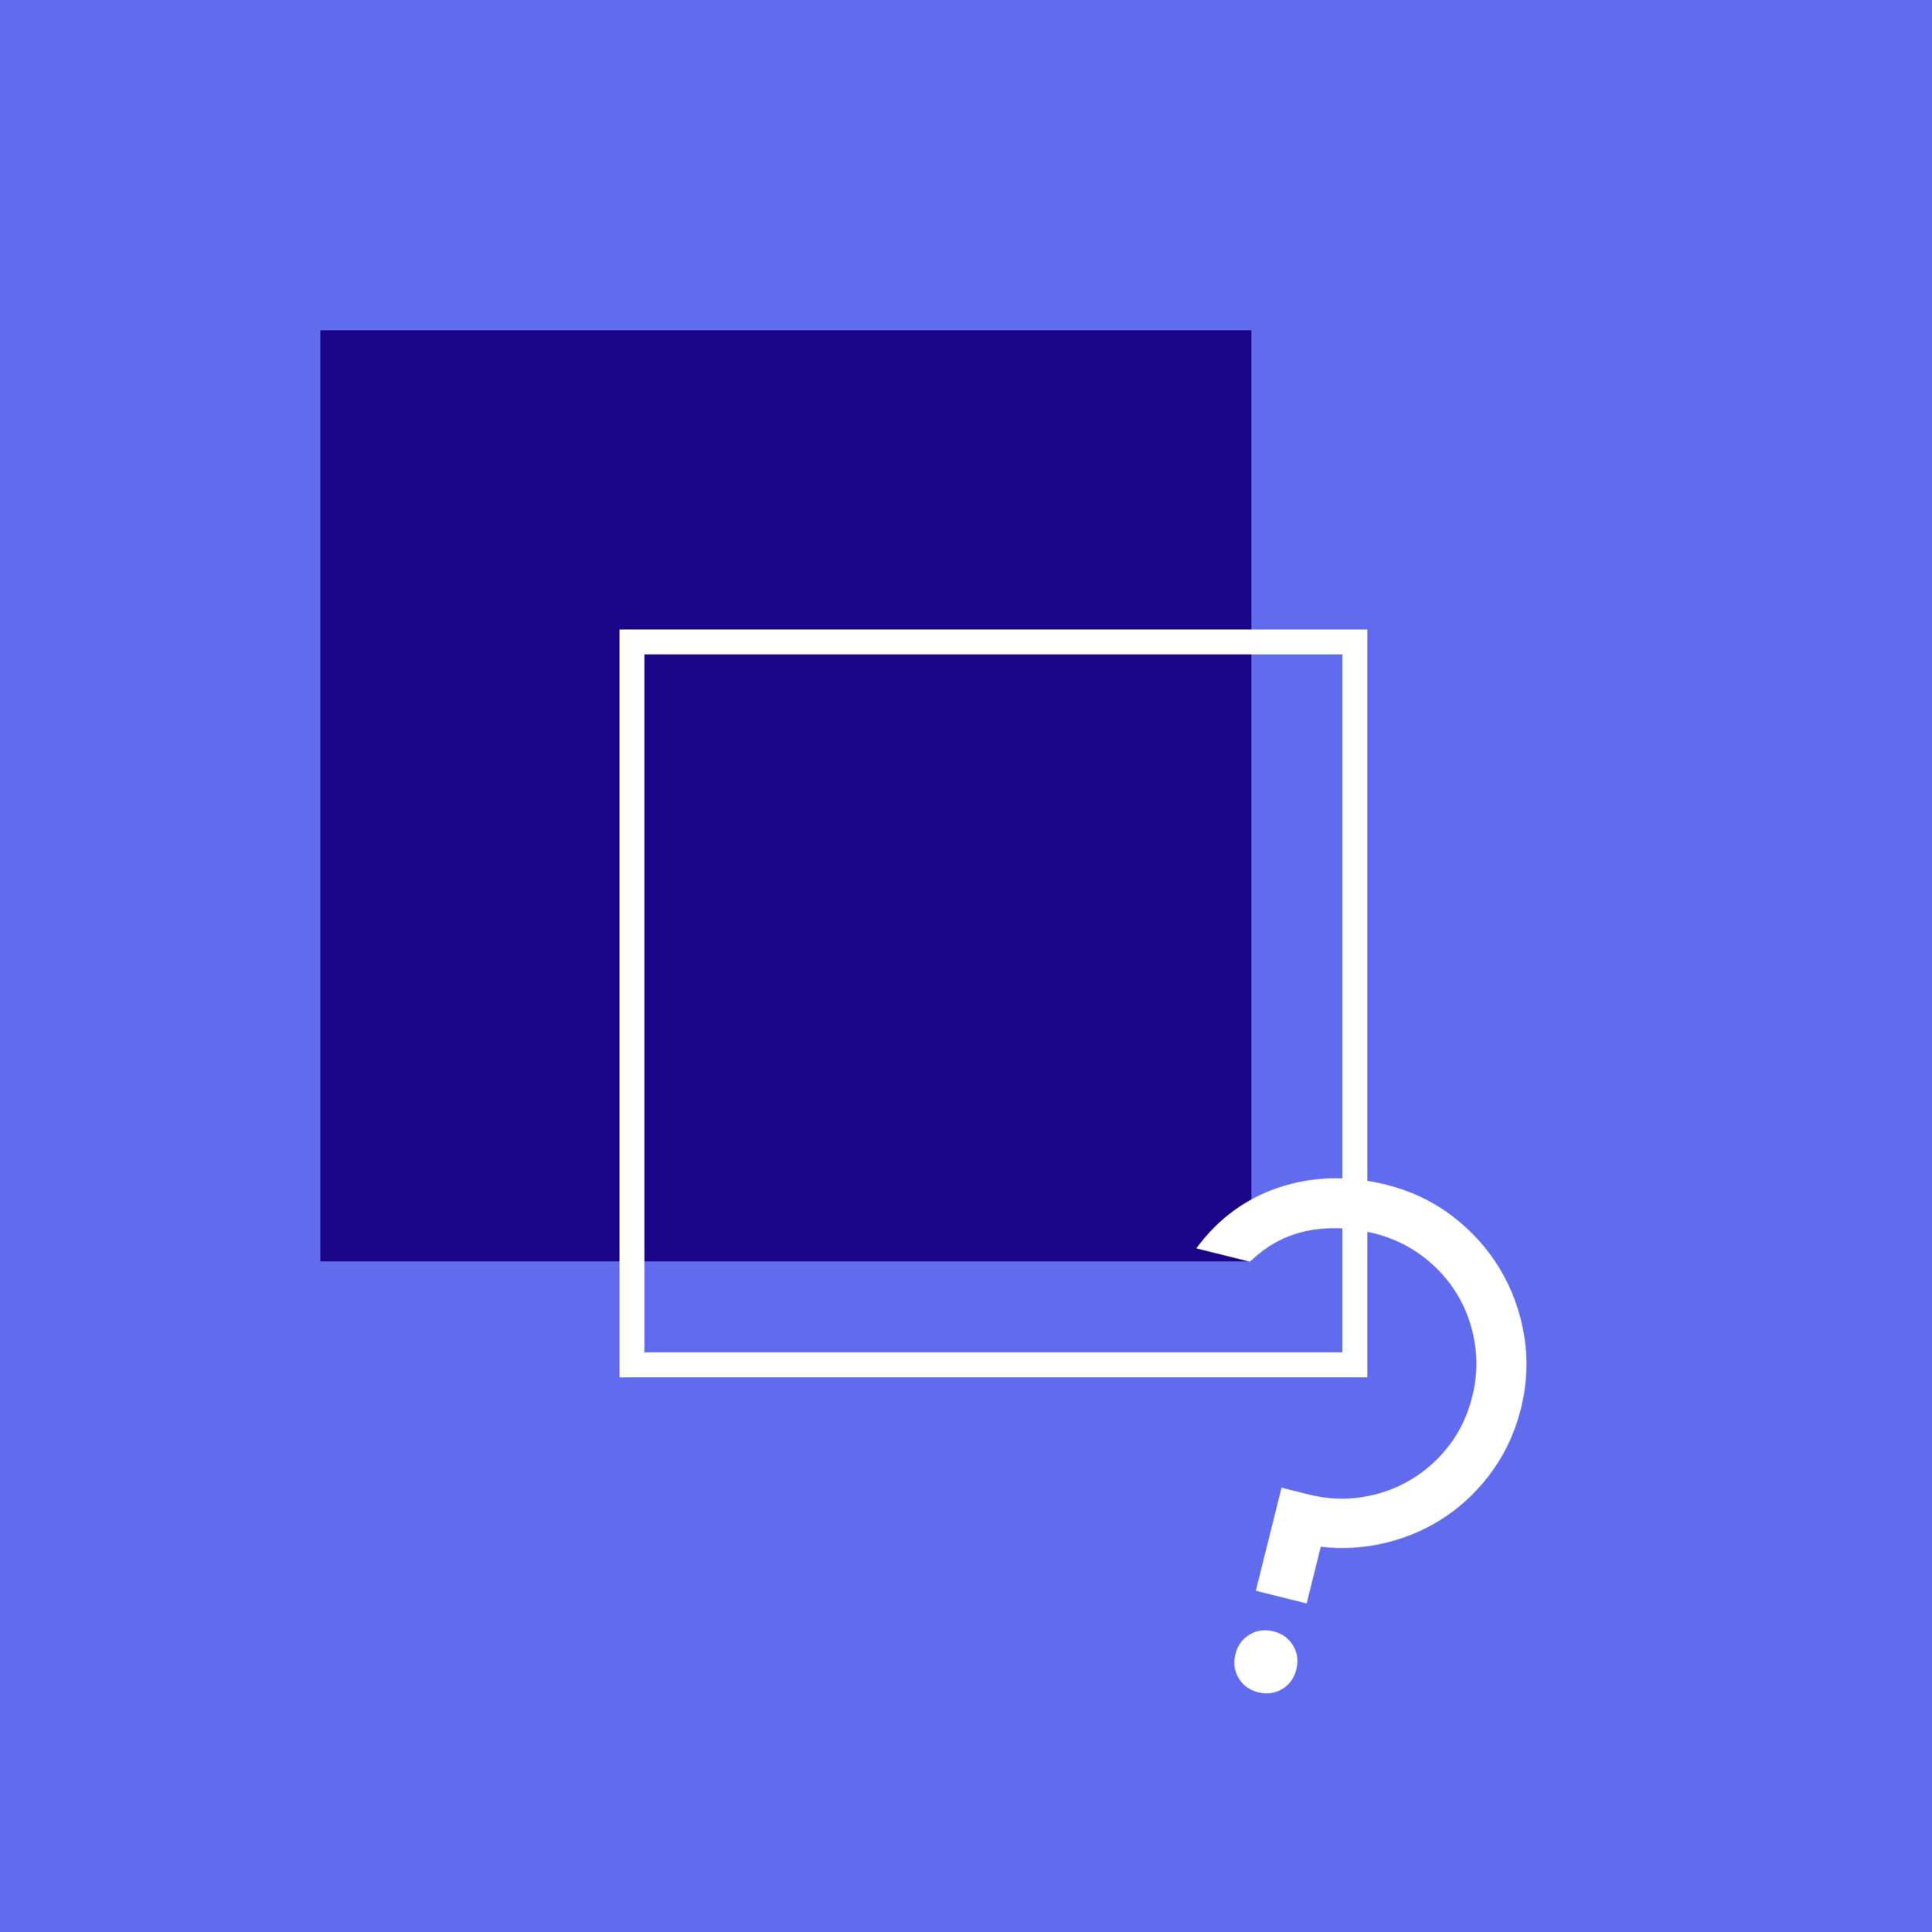 tmp logo_blue bg.png